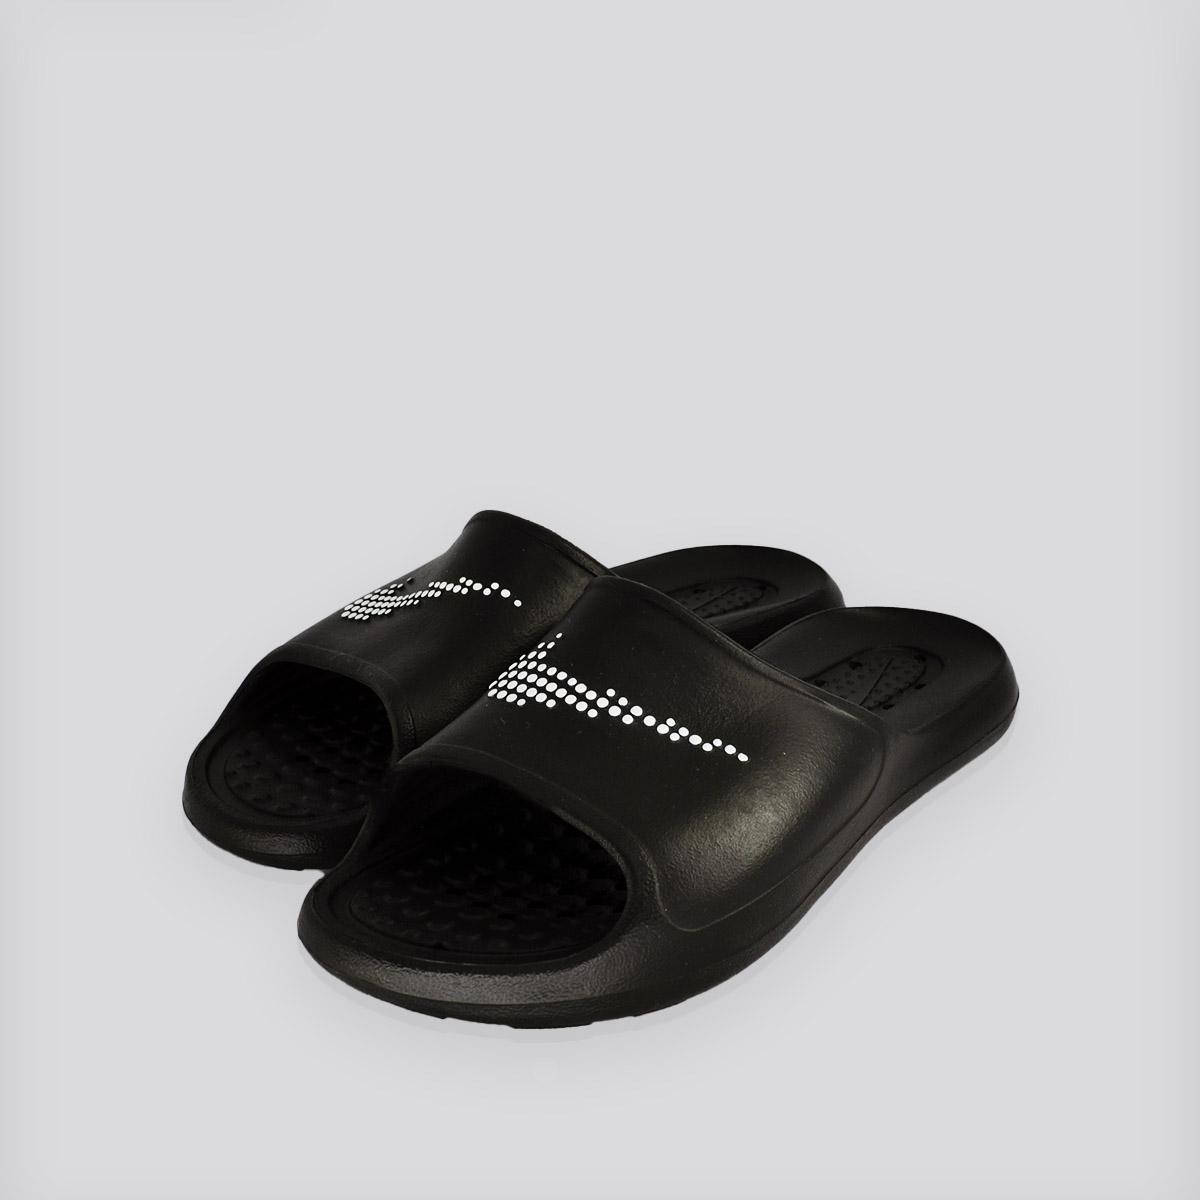 Chinelo Victori One Nike Preto